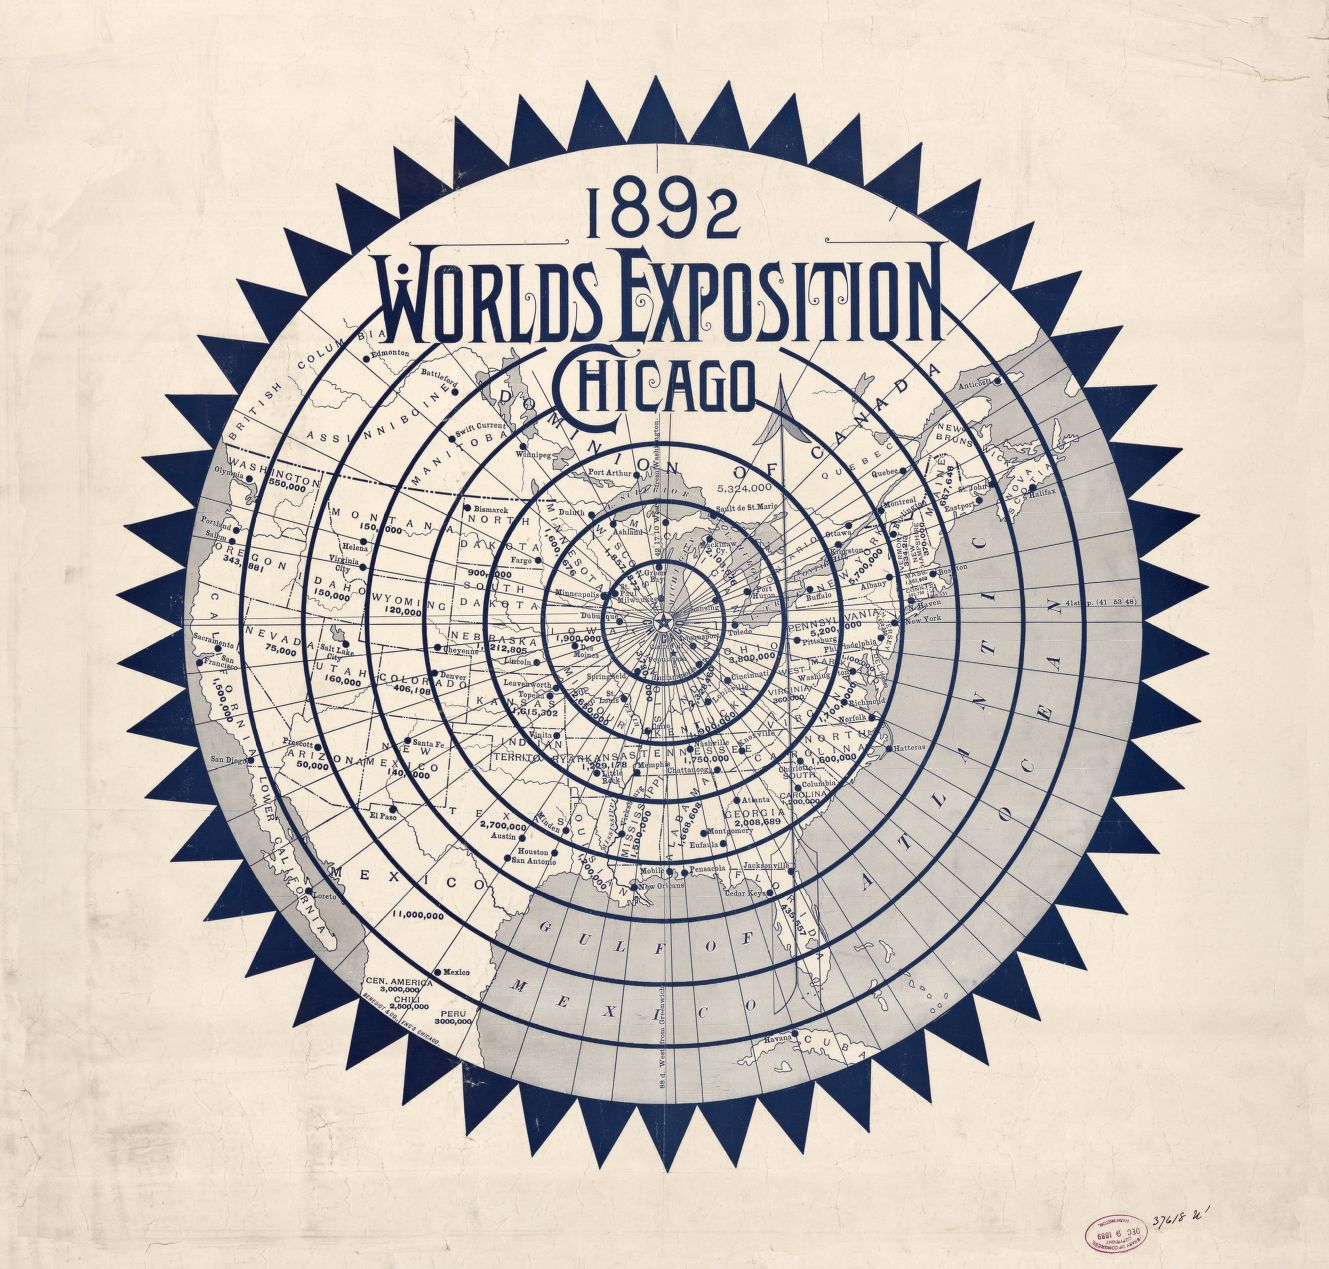 Artwork_1892_Worlds_Exposition_Chicago.jpg